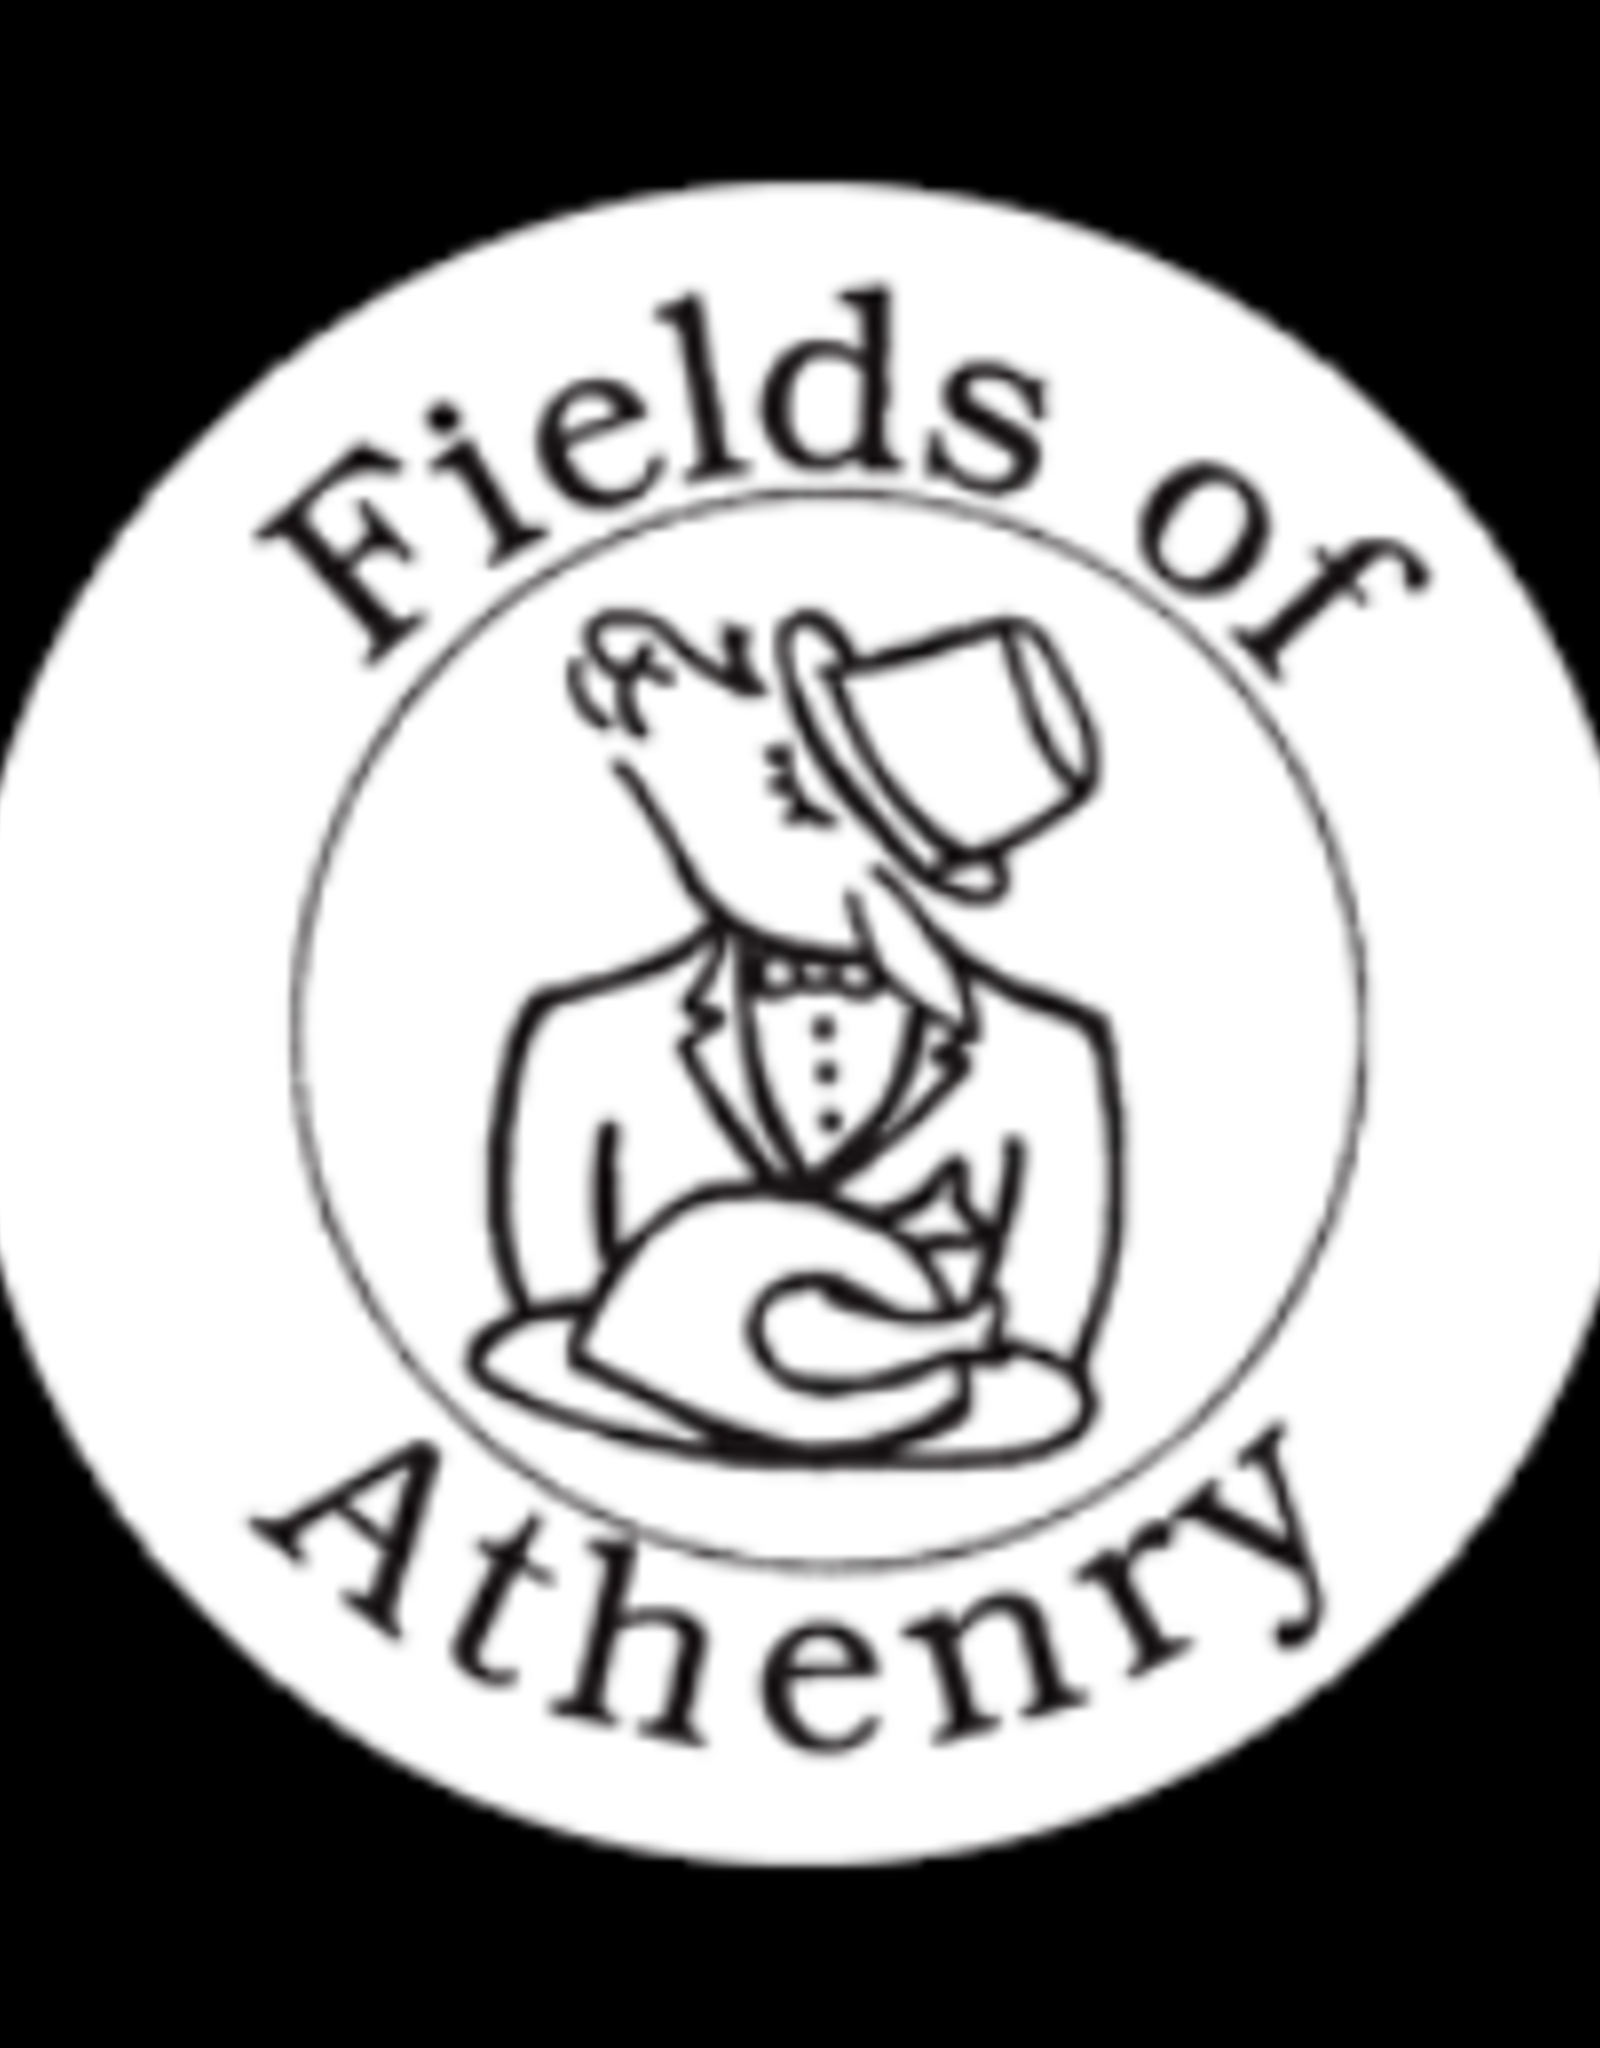 New Item Fields of Athenry Fresh Heritage Turkey 14lbs